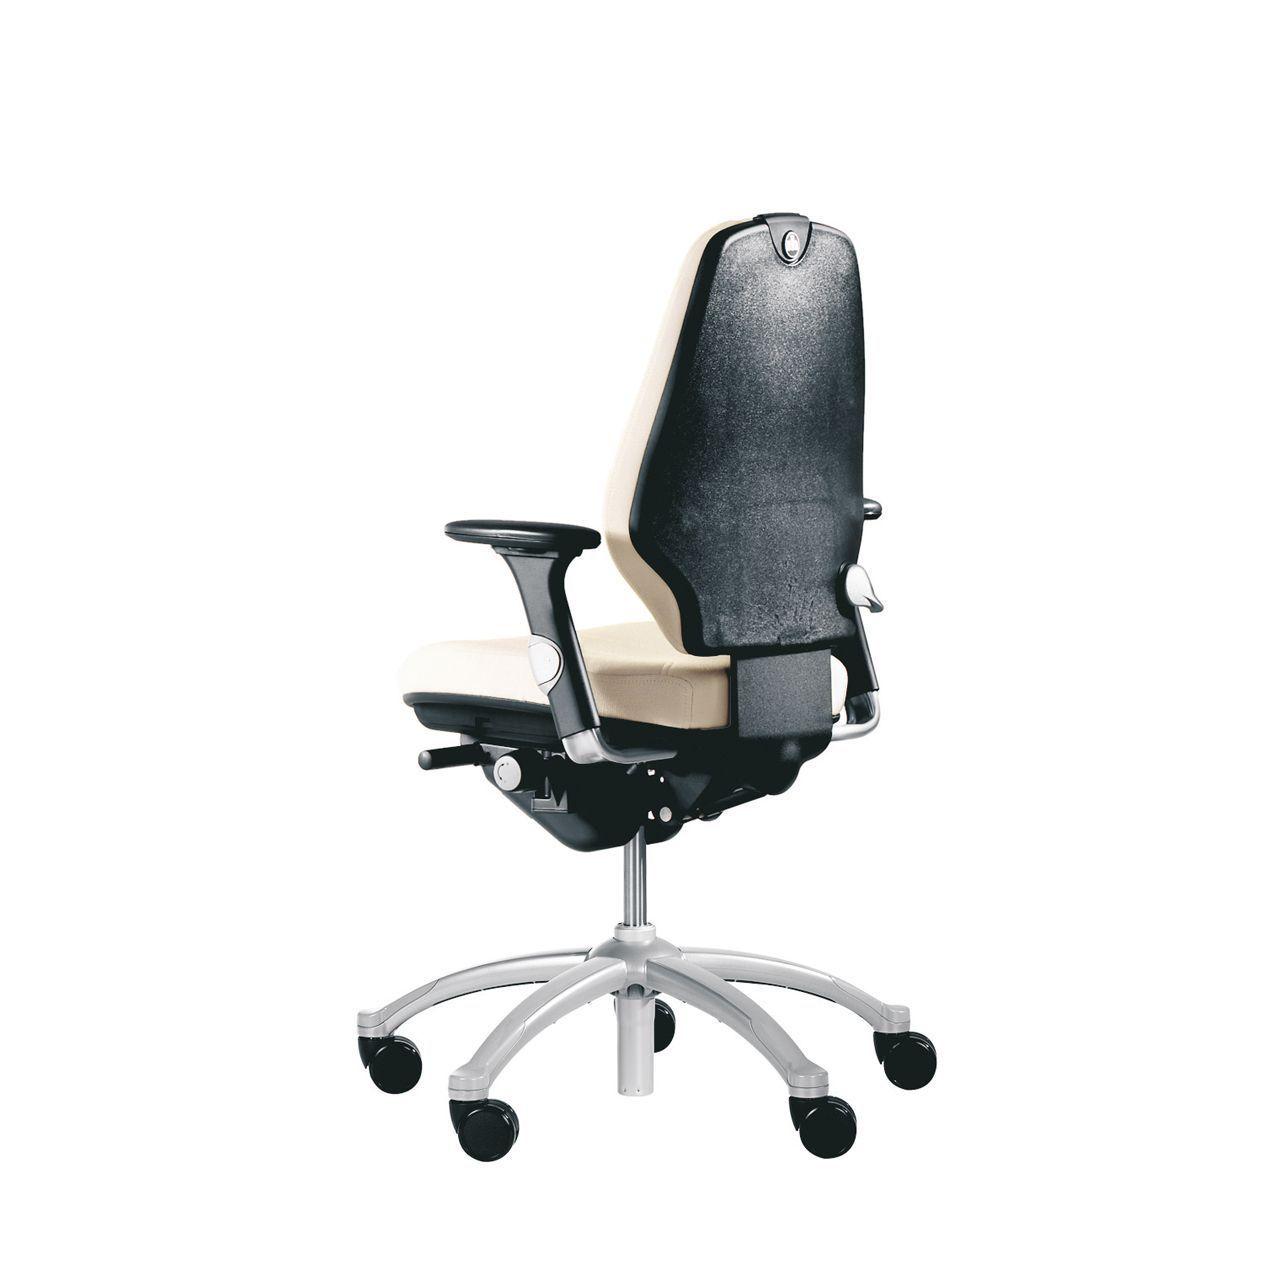 rh logic 300 24 7 ergonomische bureaustoel STKARH304 Achterkant